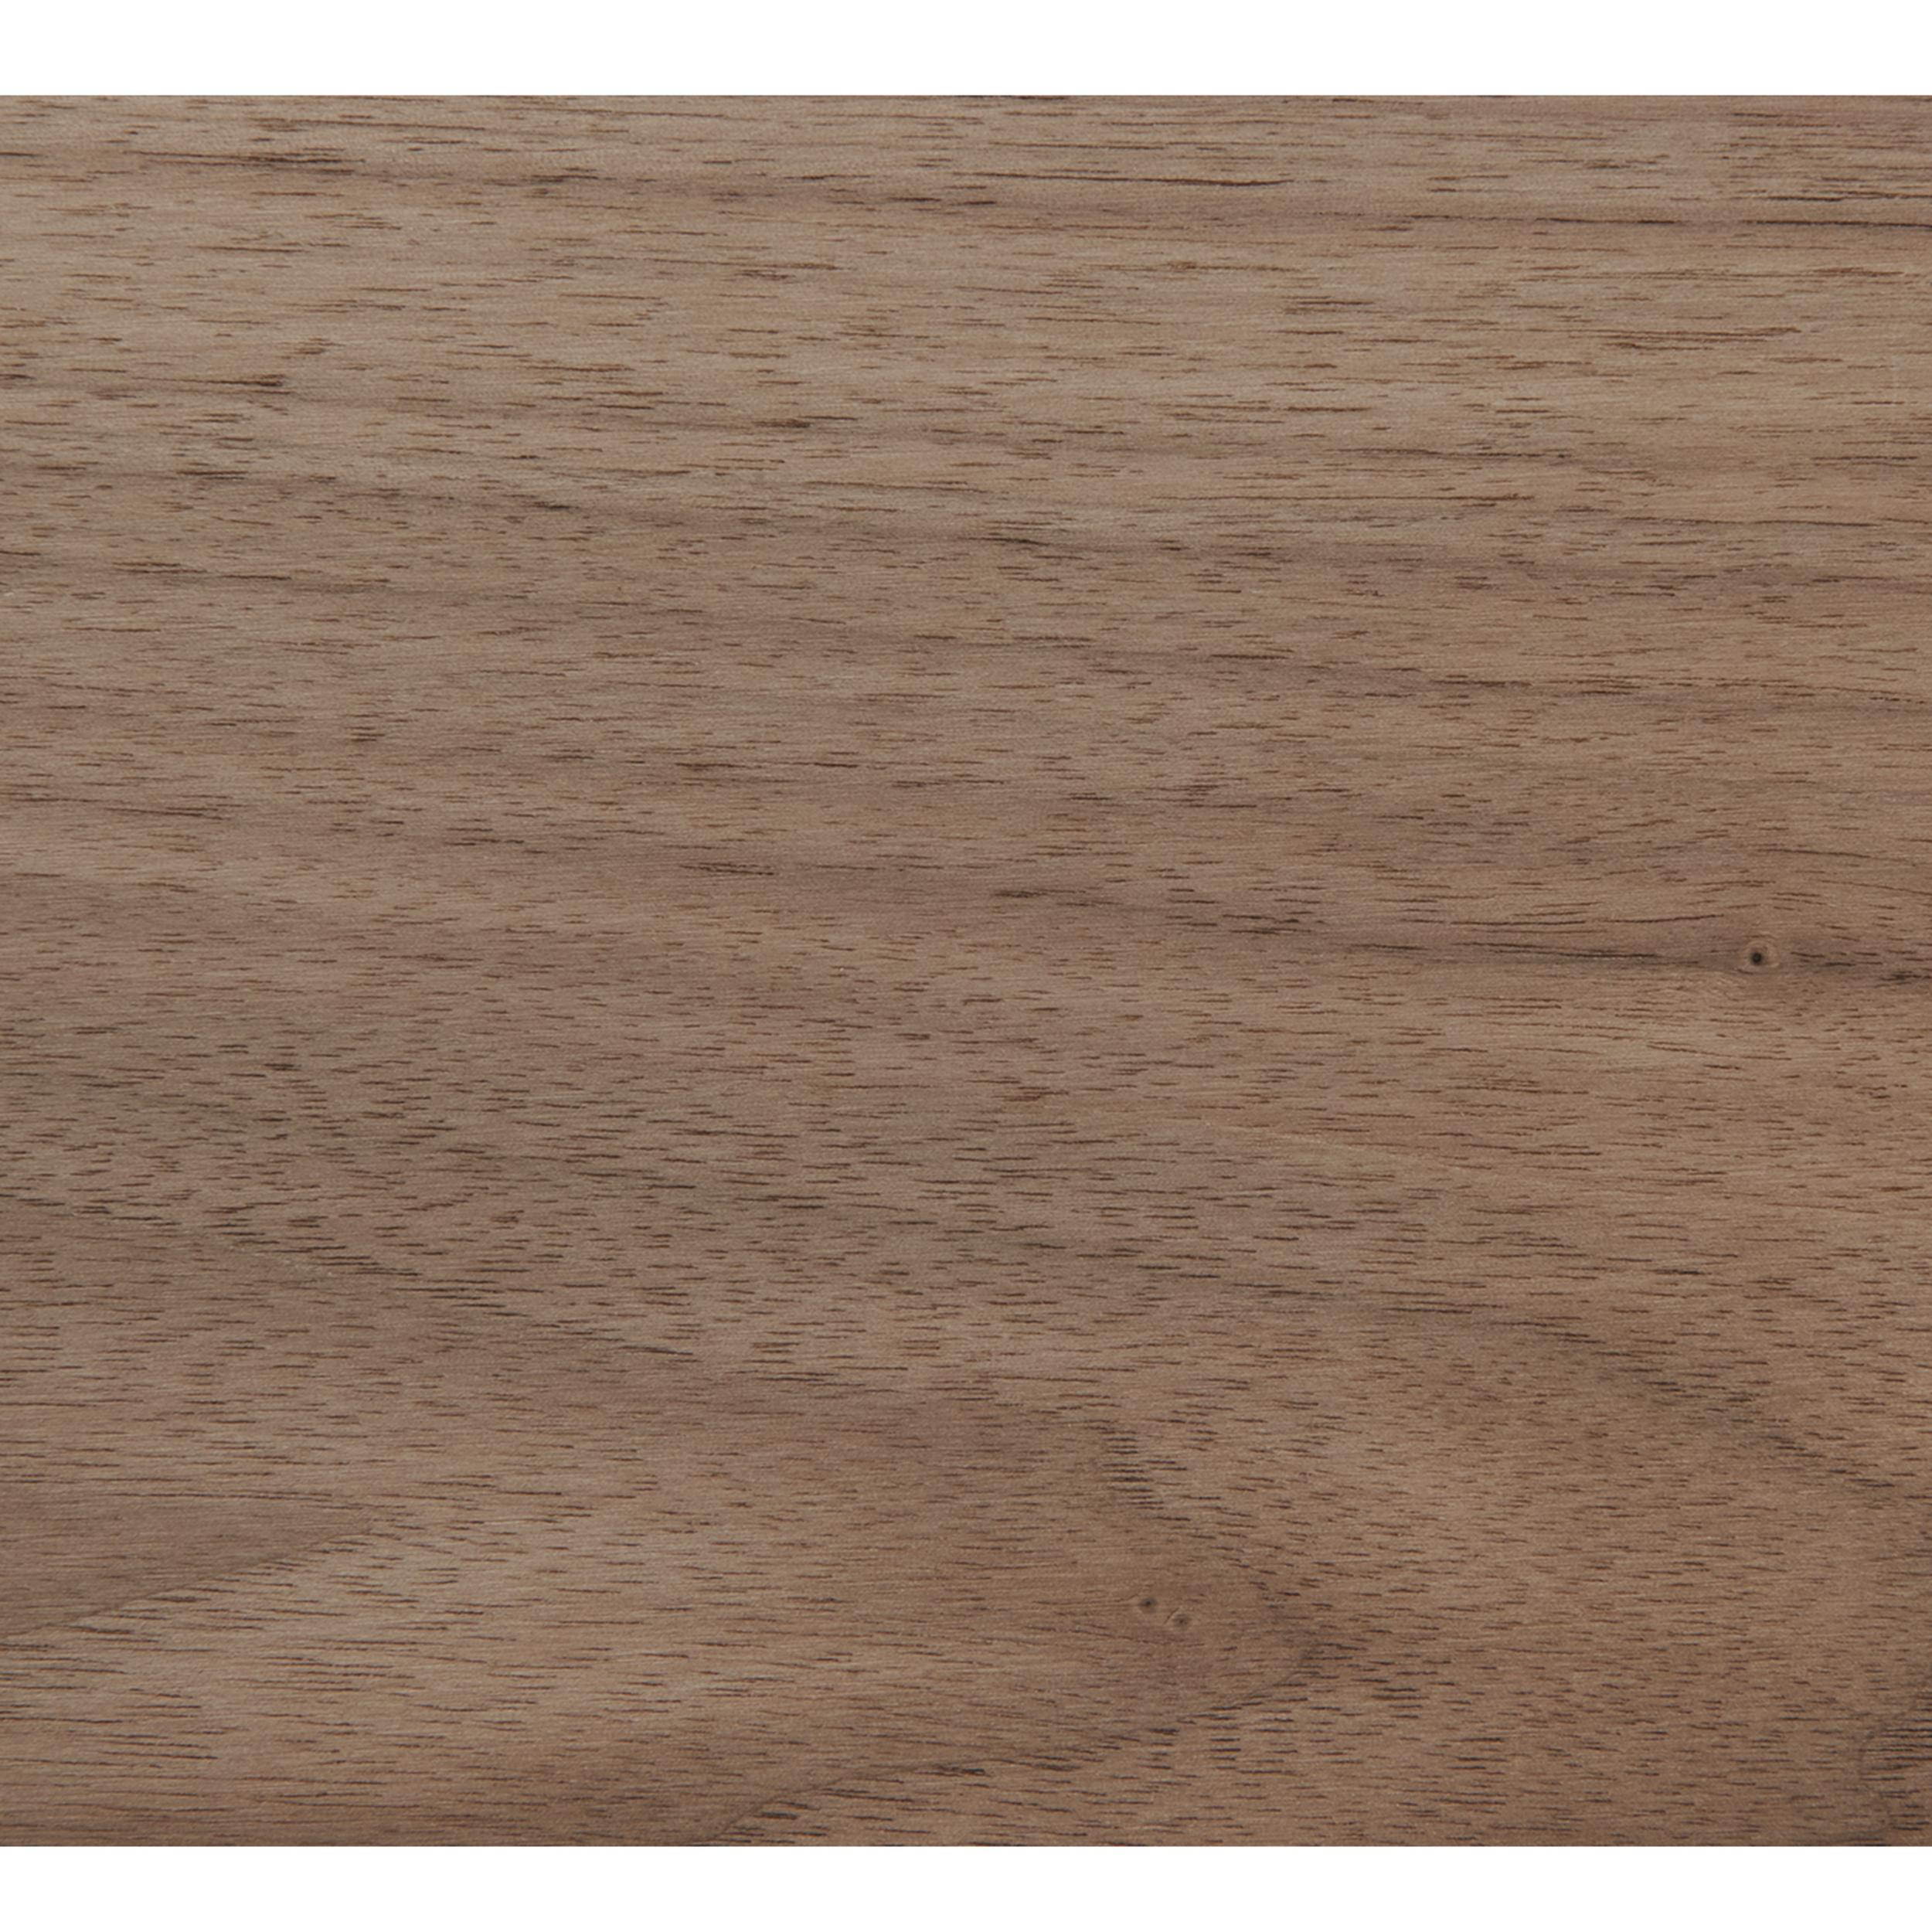 Walnut Veneer Sheet Plain Sliced 4' x 8' 2-Ply Wood on Wood